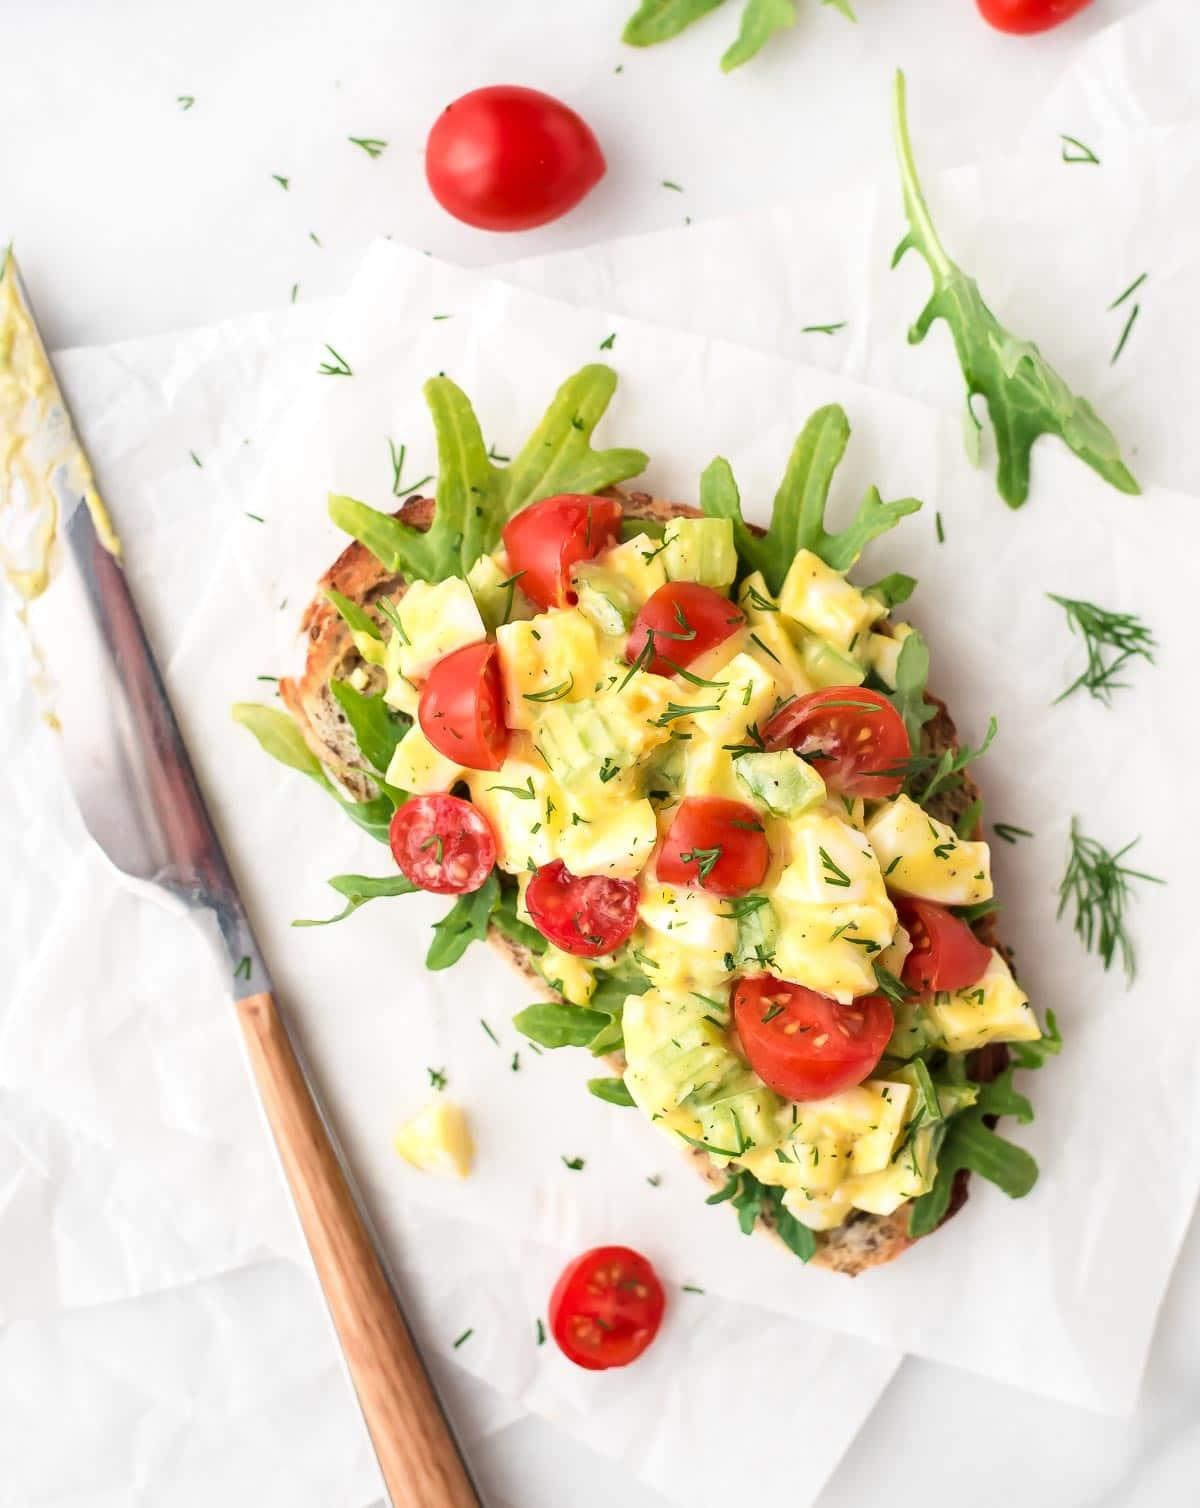 Healthy Egg Salad with Greek Yogurt and Dill